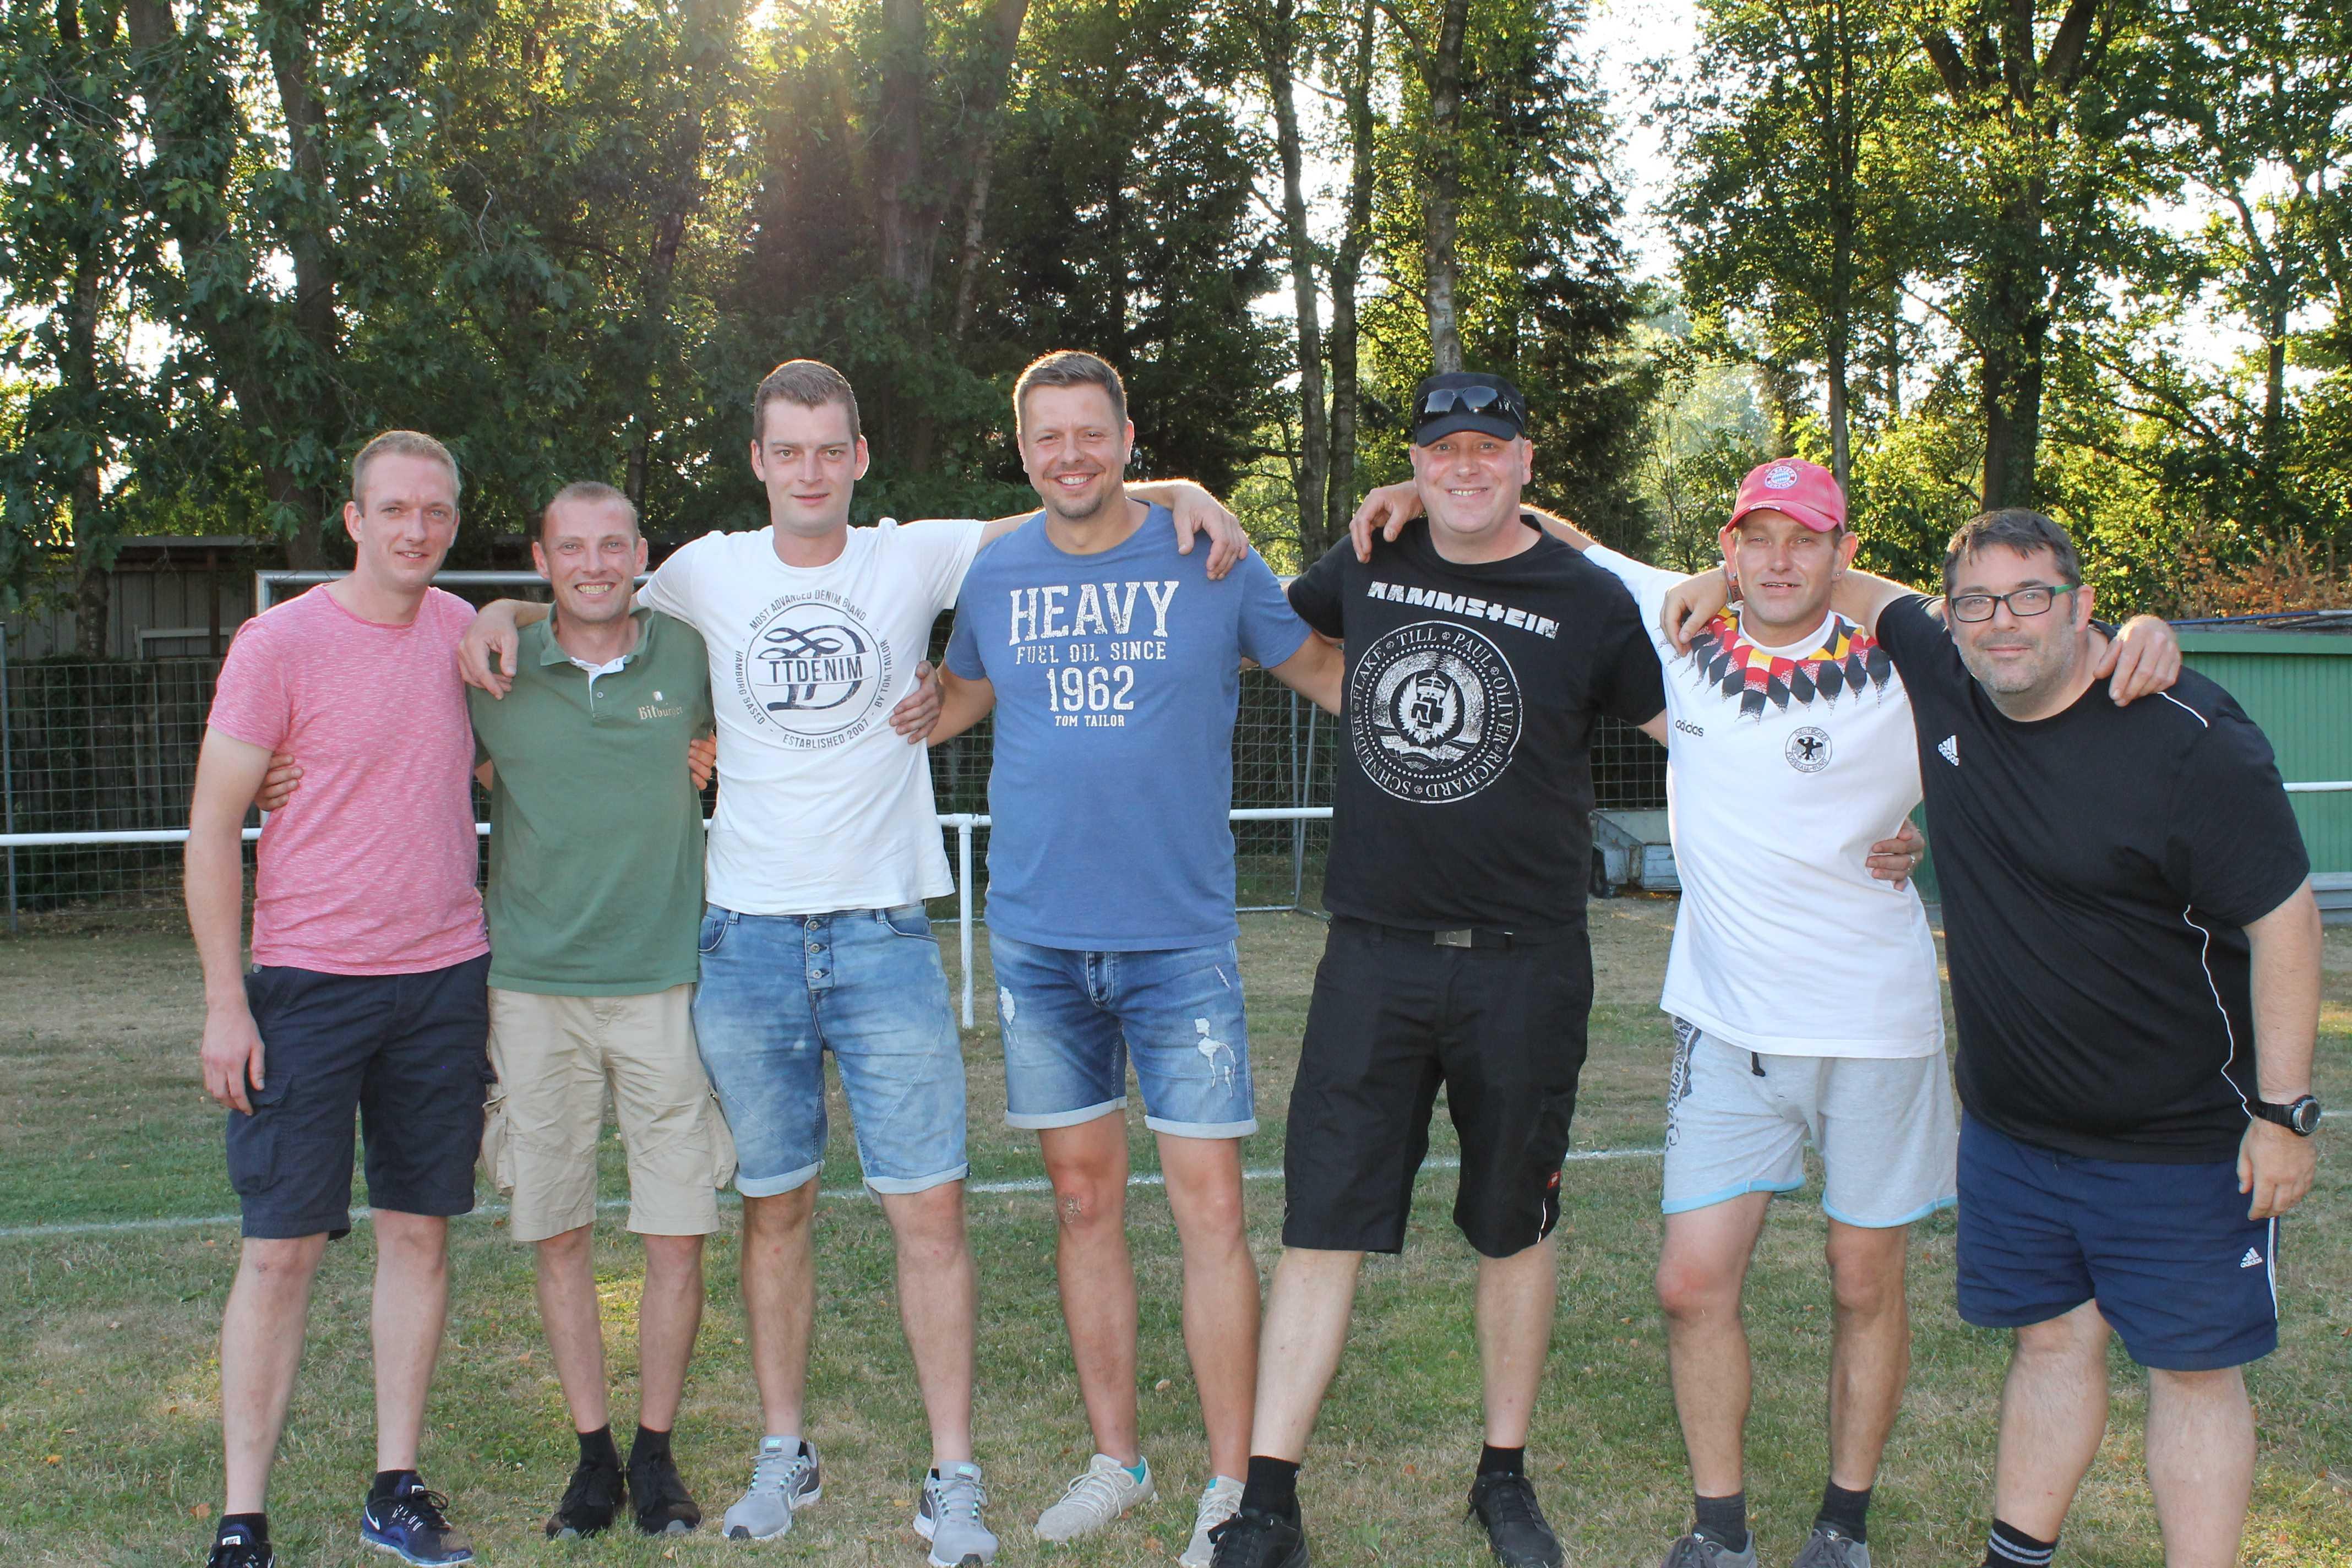 2018-07-27 Sportwoche - Flunkyball Turnier (33)